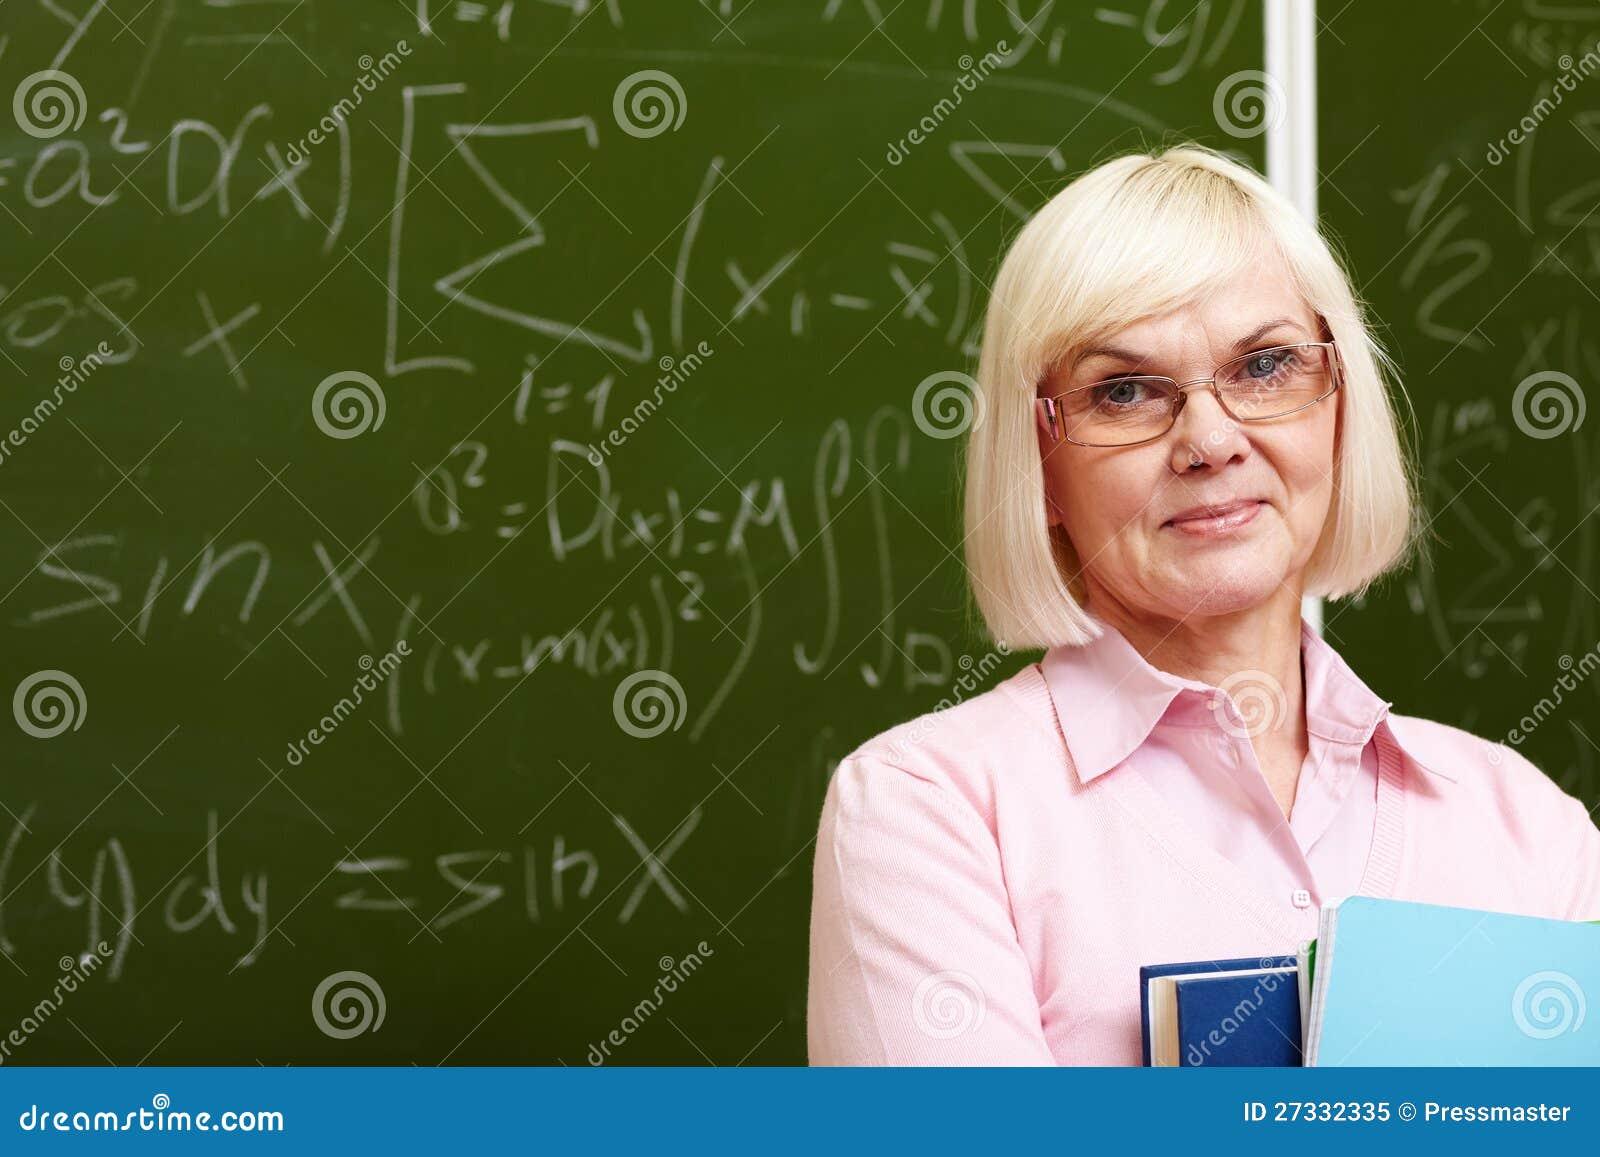 experienced teacher royalty free stock photo image 27332335